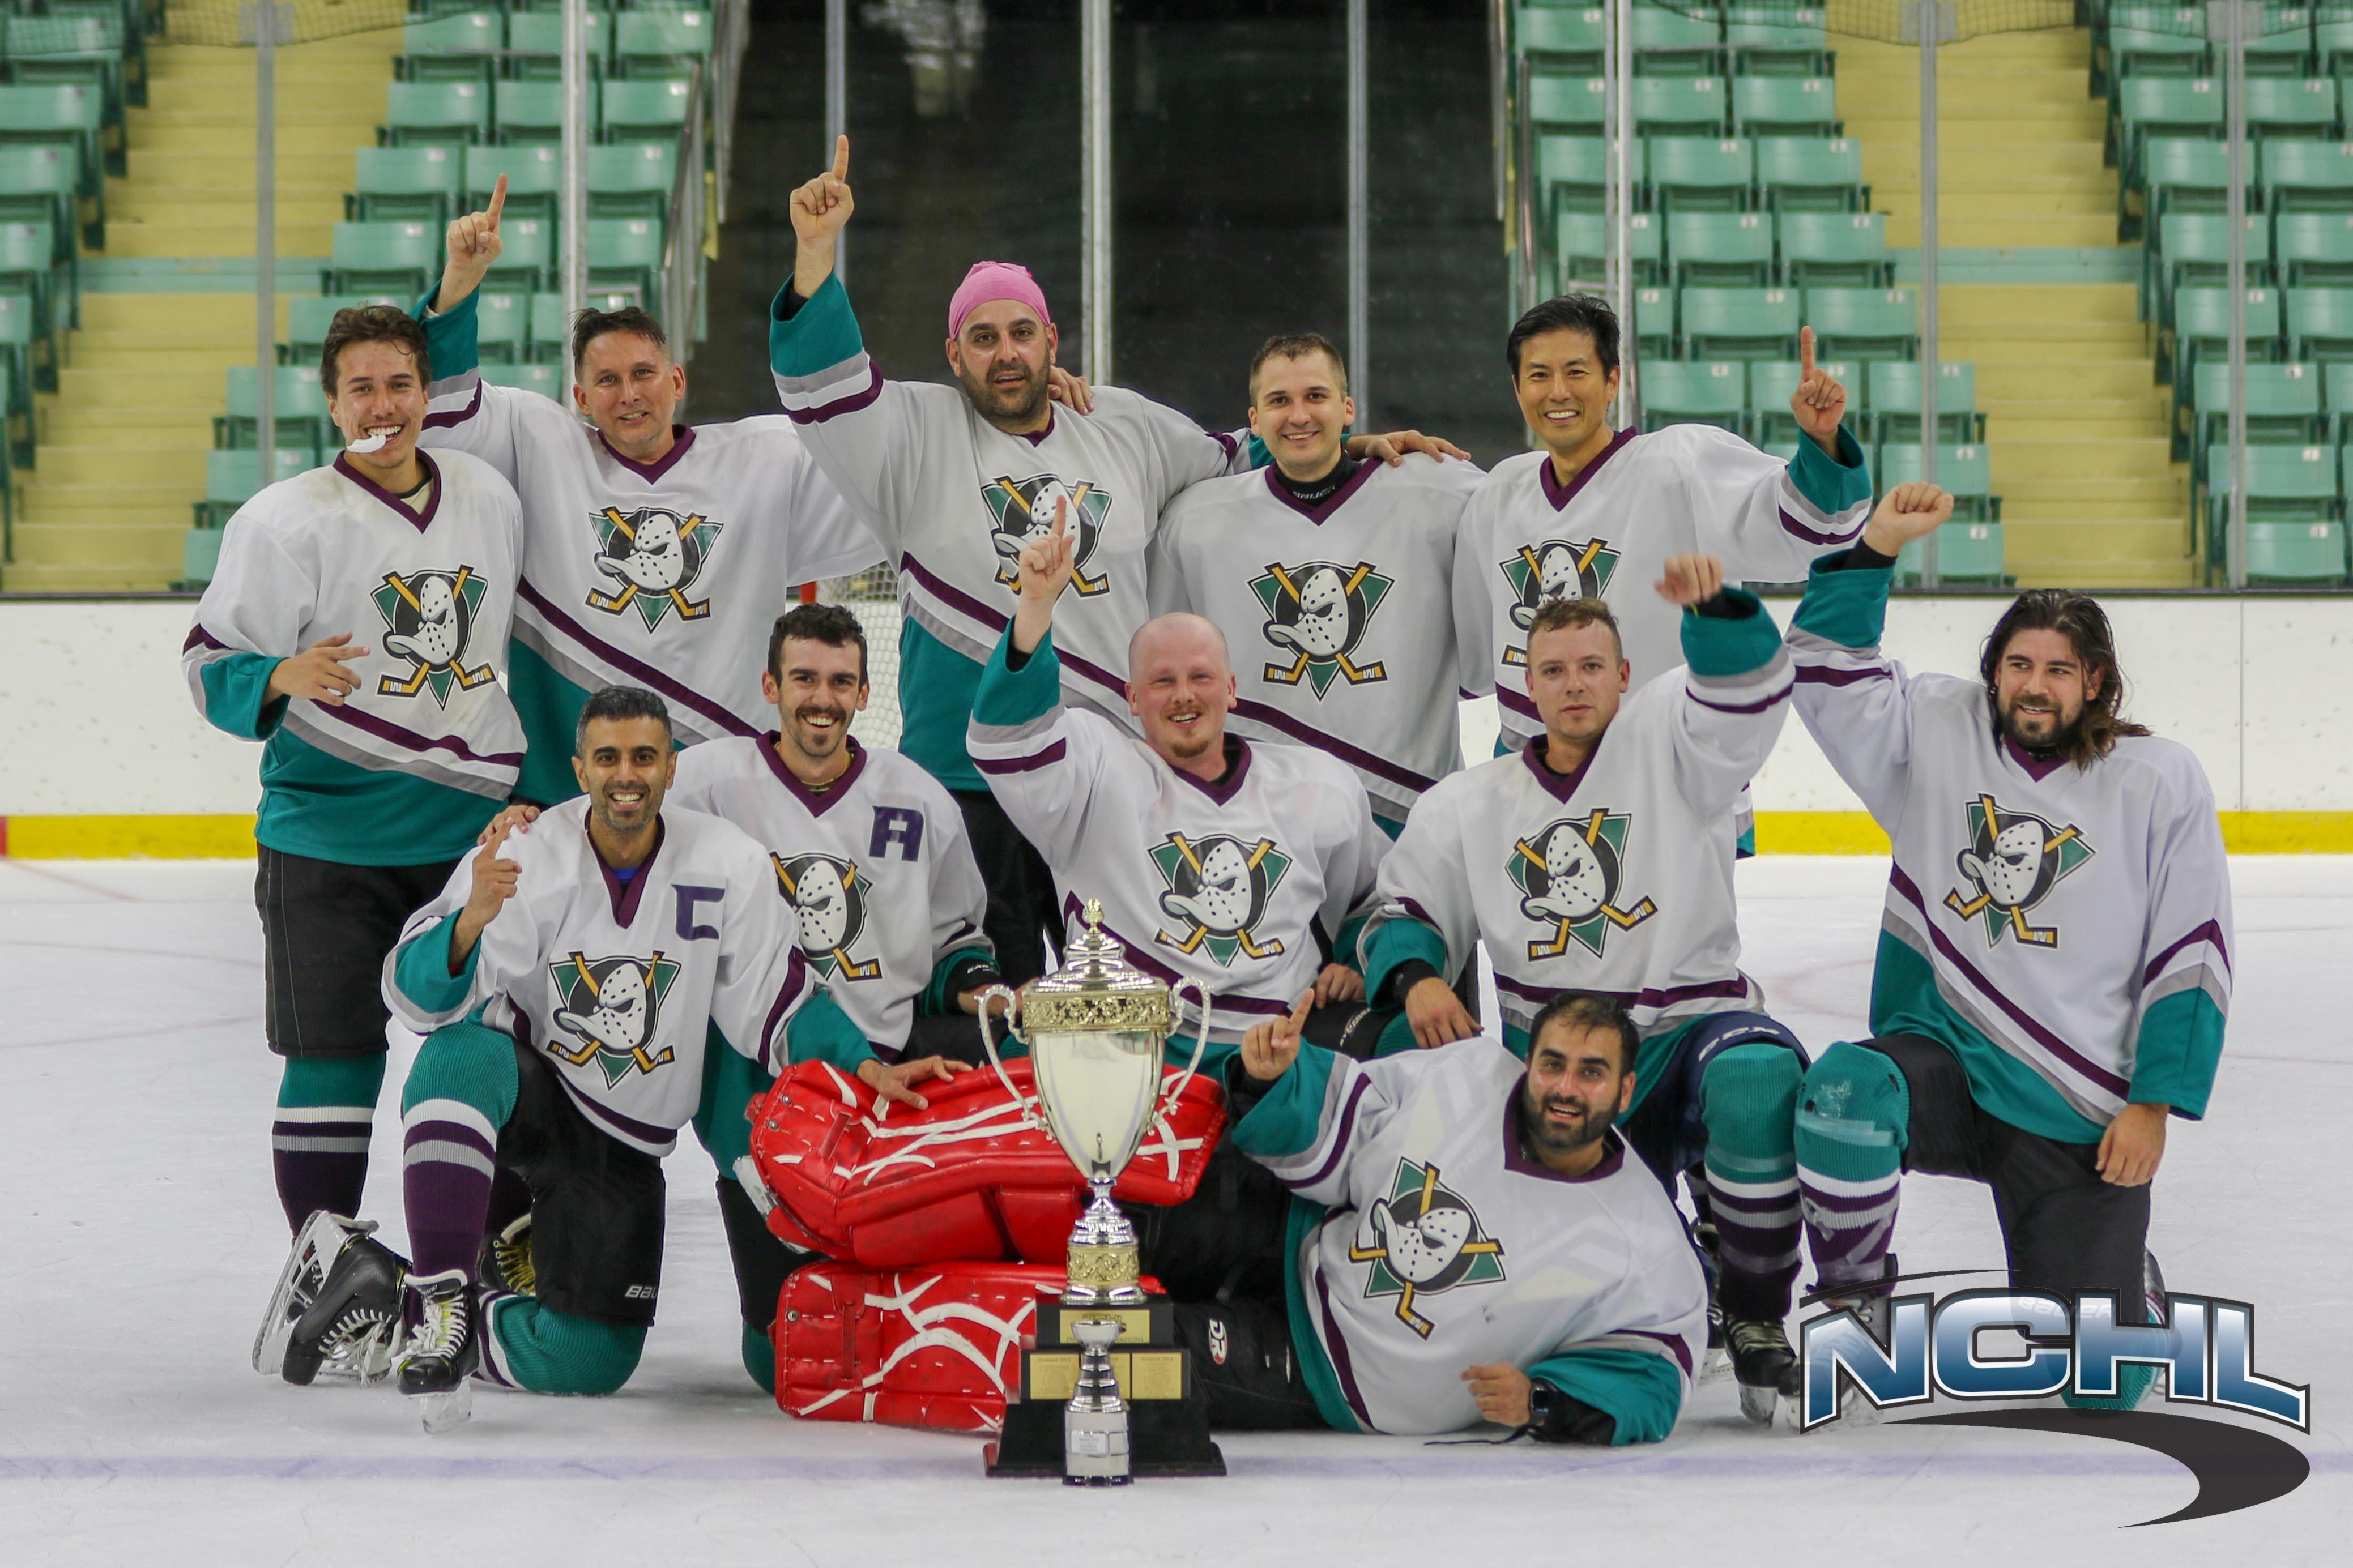 River Cree Hockey League Edmonton